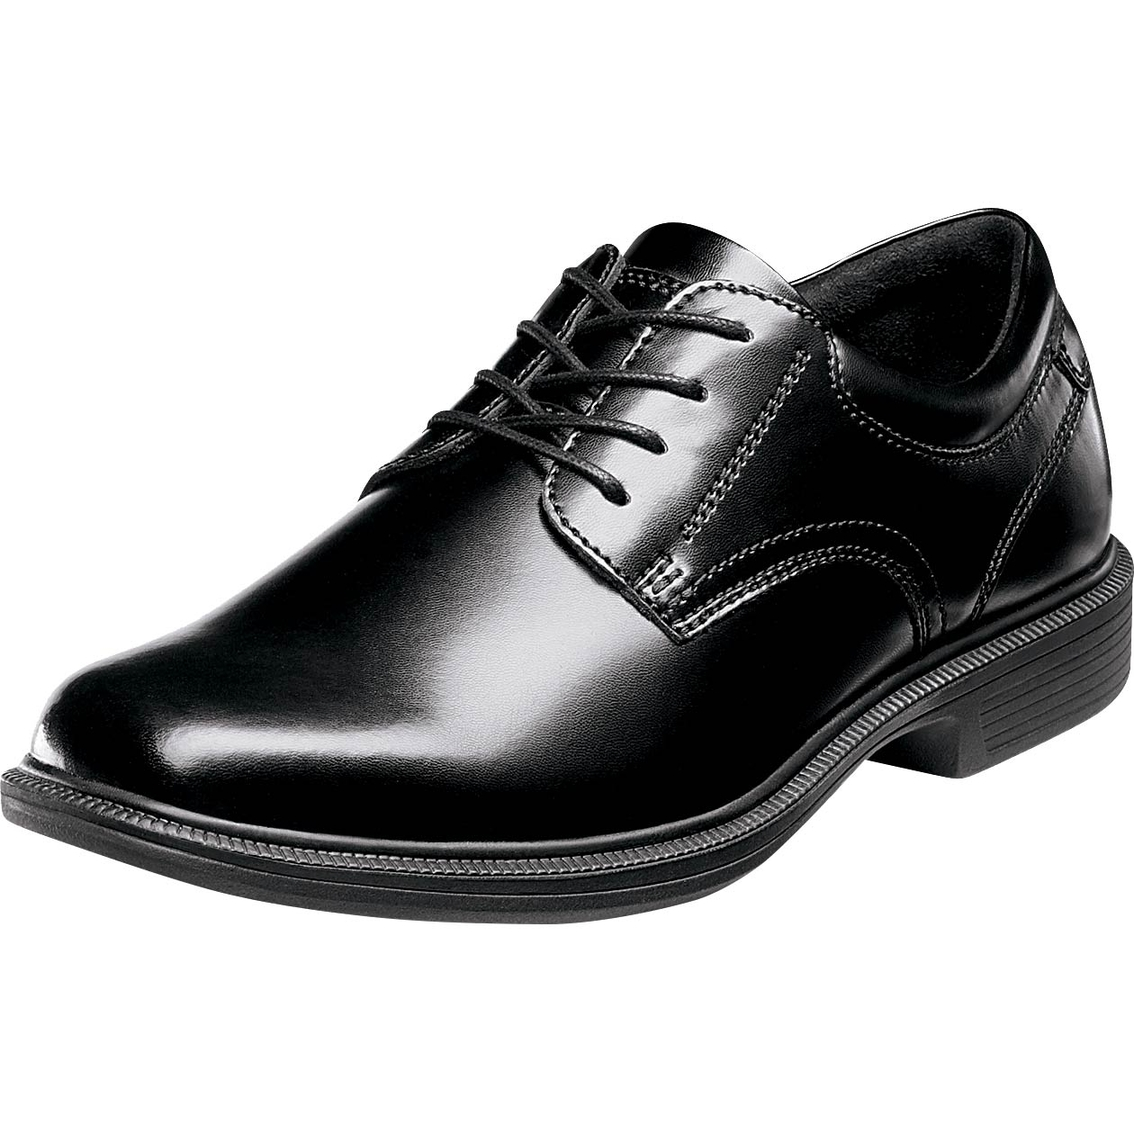 Nunn Bush Men S Baker St Dress Casual Oxford Shoes